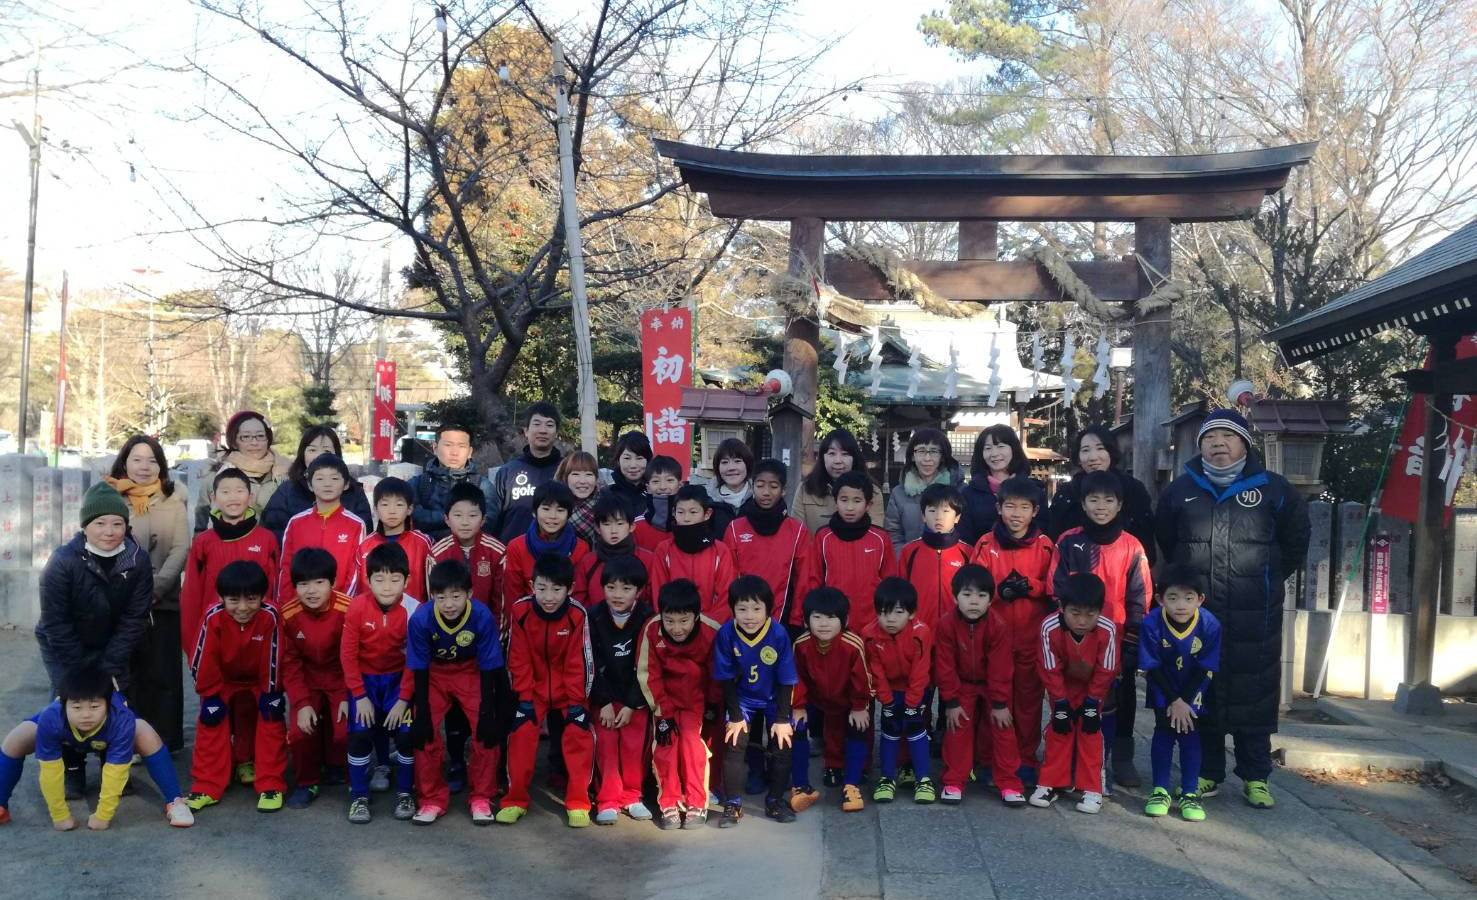 2018年 初蹴り熊野神社